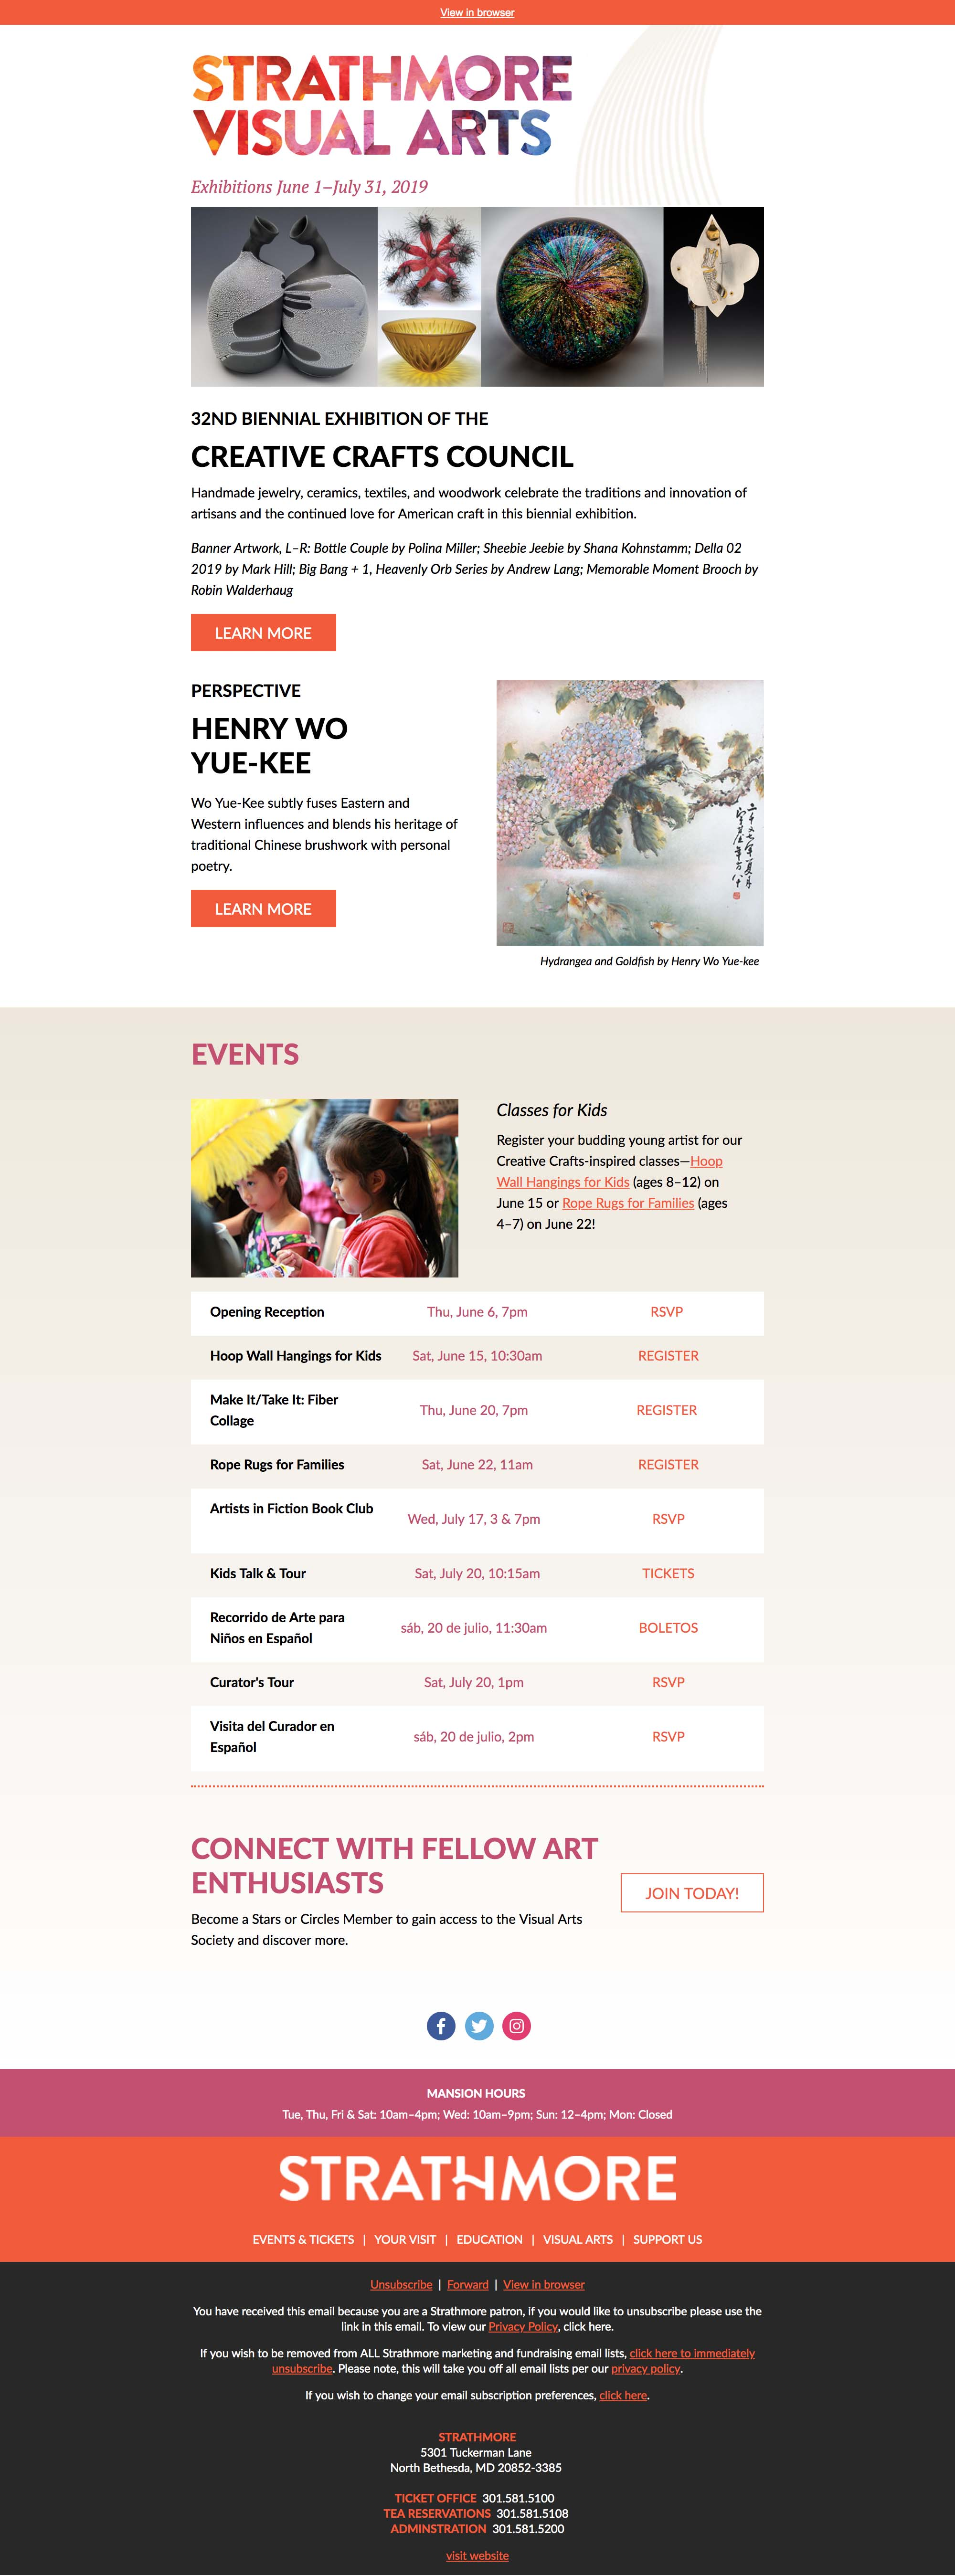 Creative Crafts Council Exhibition Opens Today - desktop view